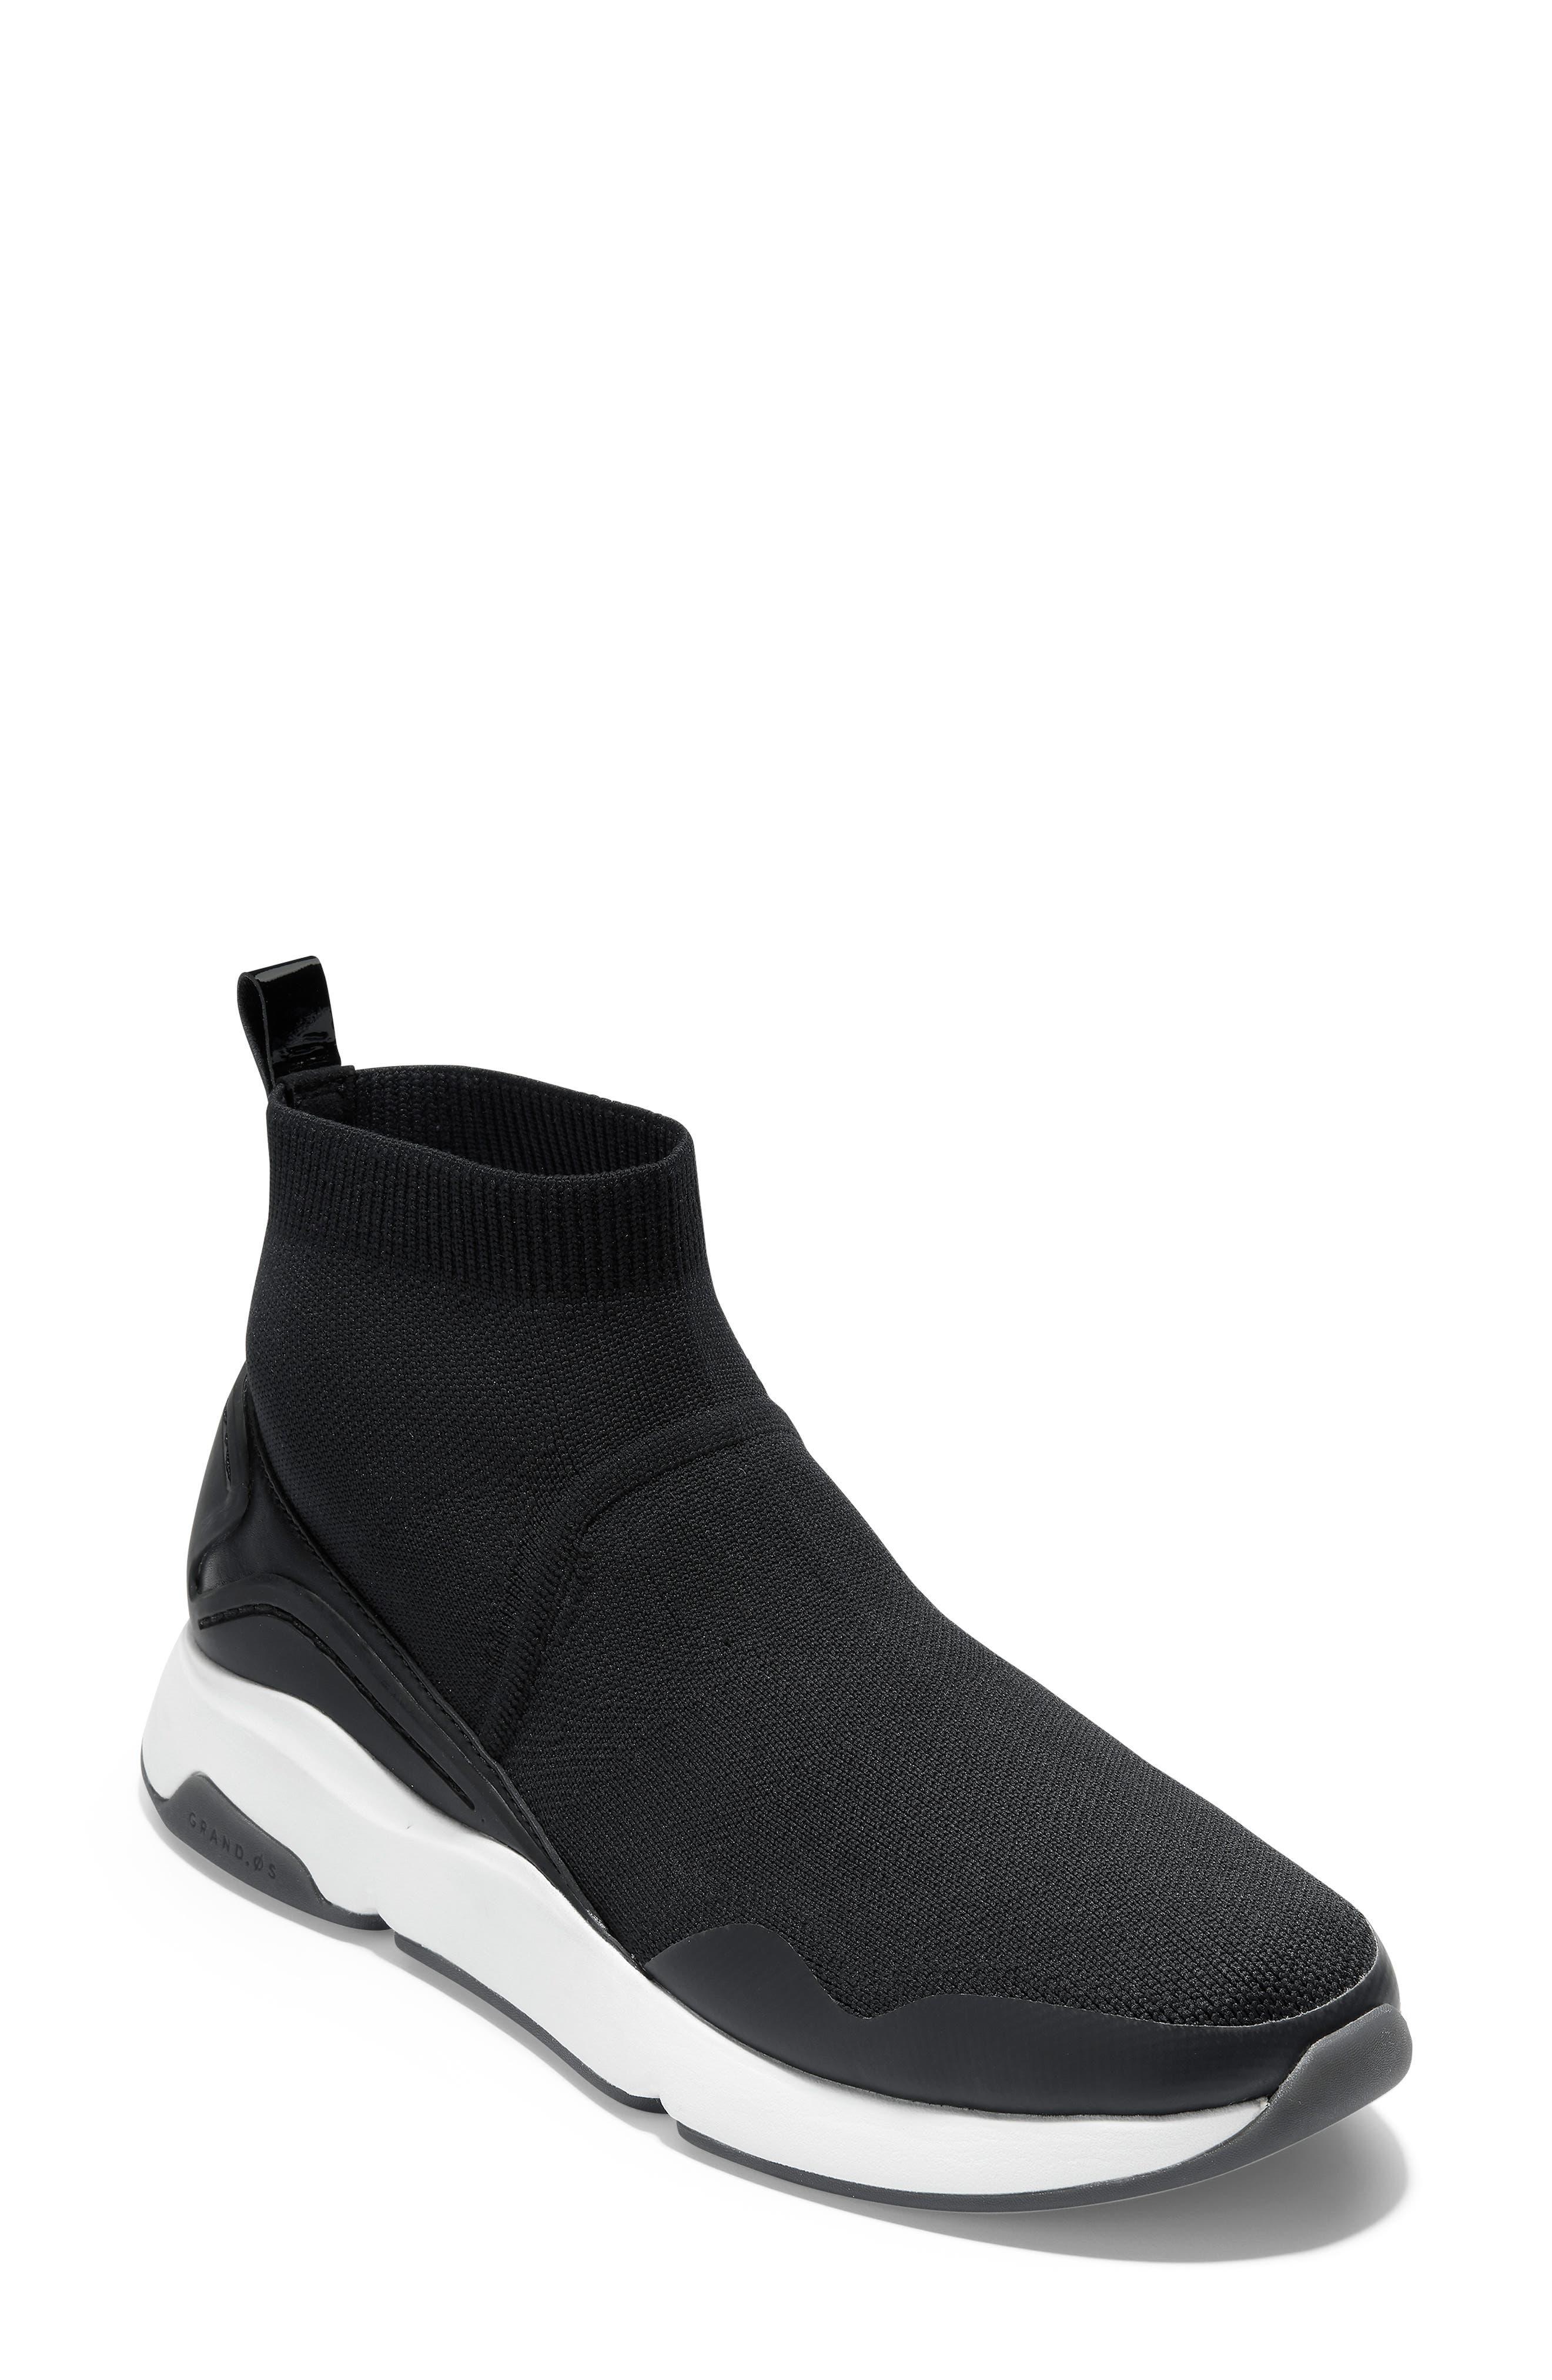 ZeroGrand Motion Slip-On Sneaker, Main, color, BLACK LEATHER